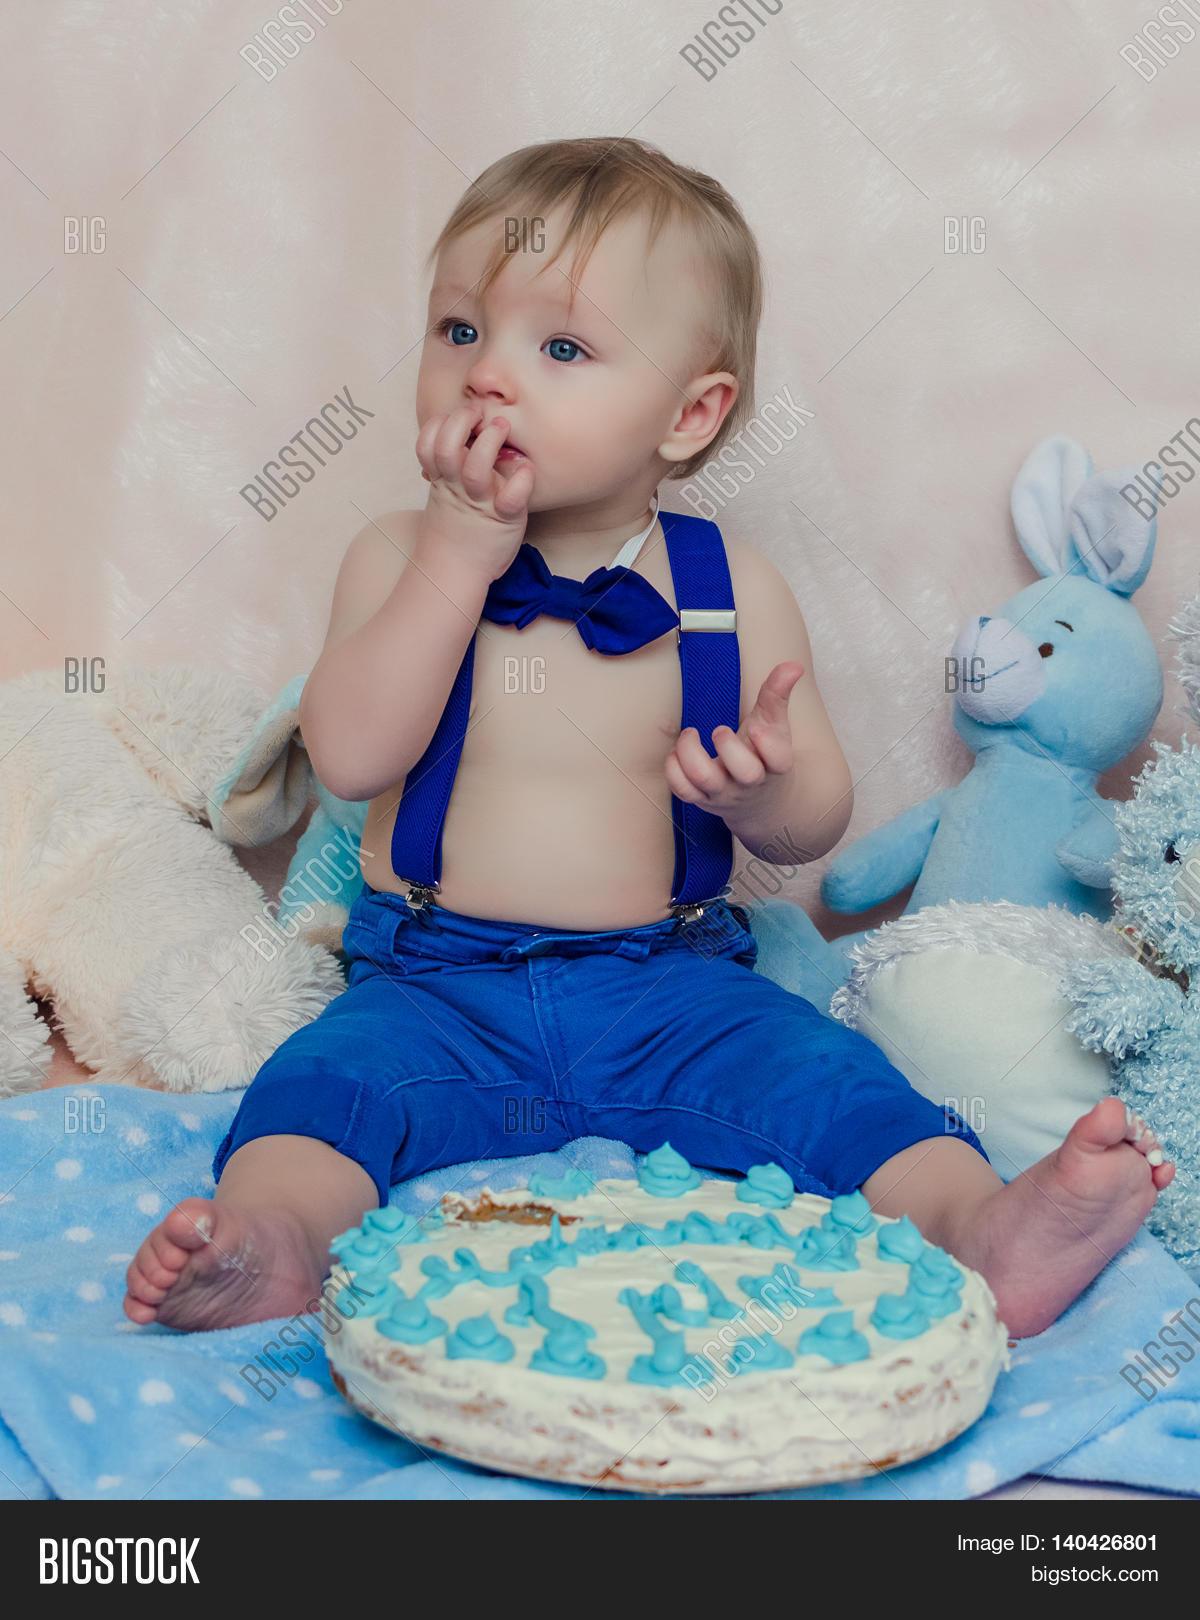 Funny Baby Boy Tasting Cake Blue Image &